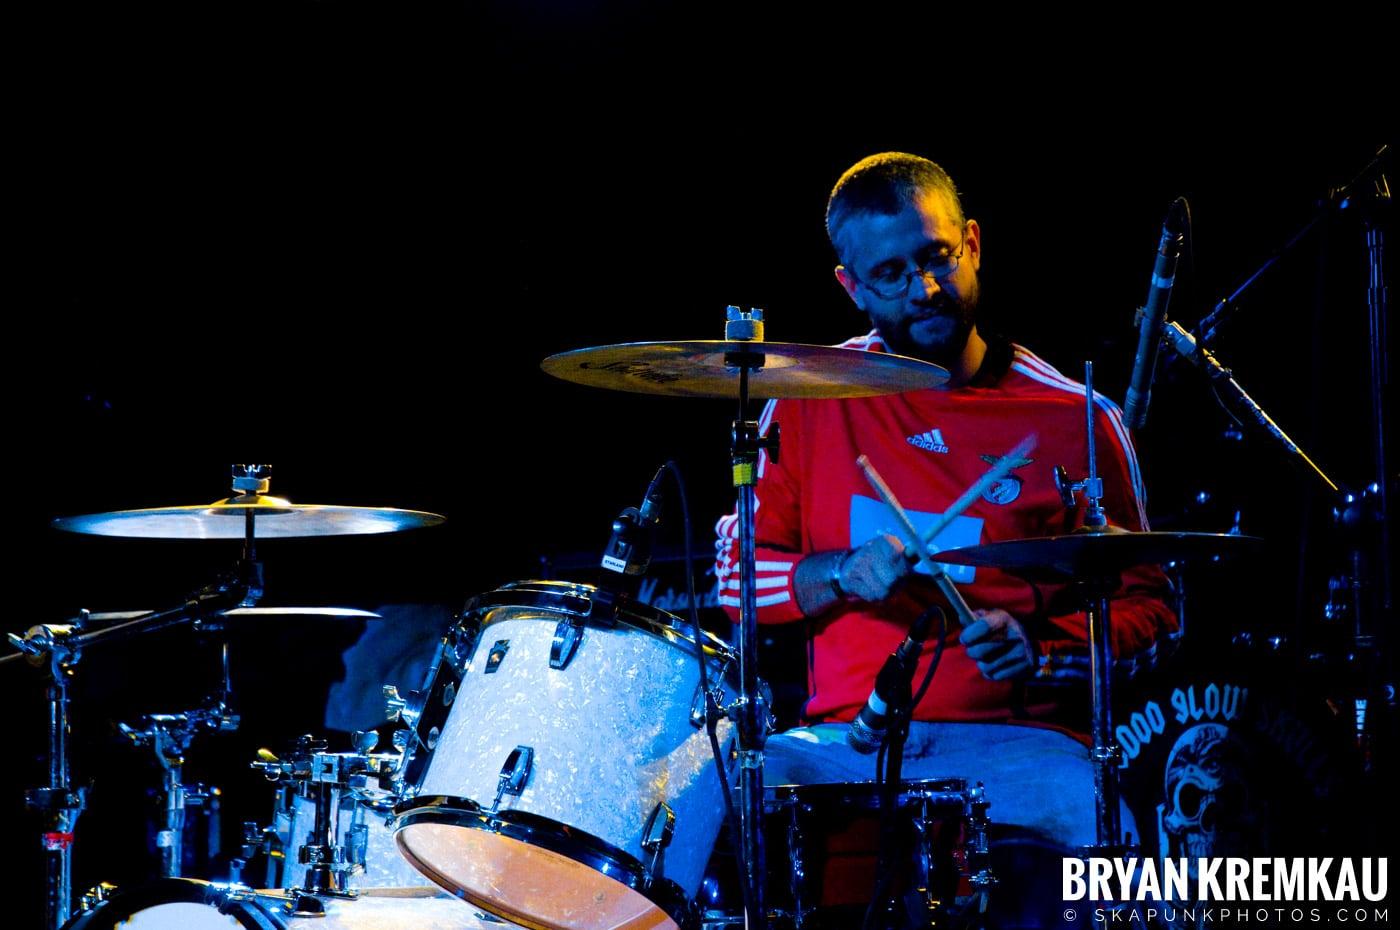 Hub City Stompers (Ska is Dead Tour) @ Starland Ballroom, Sayreville, NJ - 11.15.09 (13)